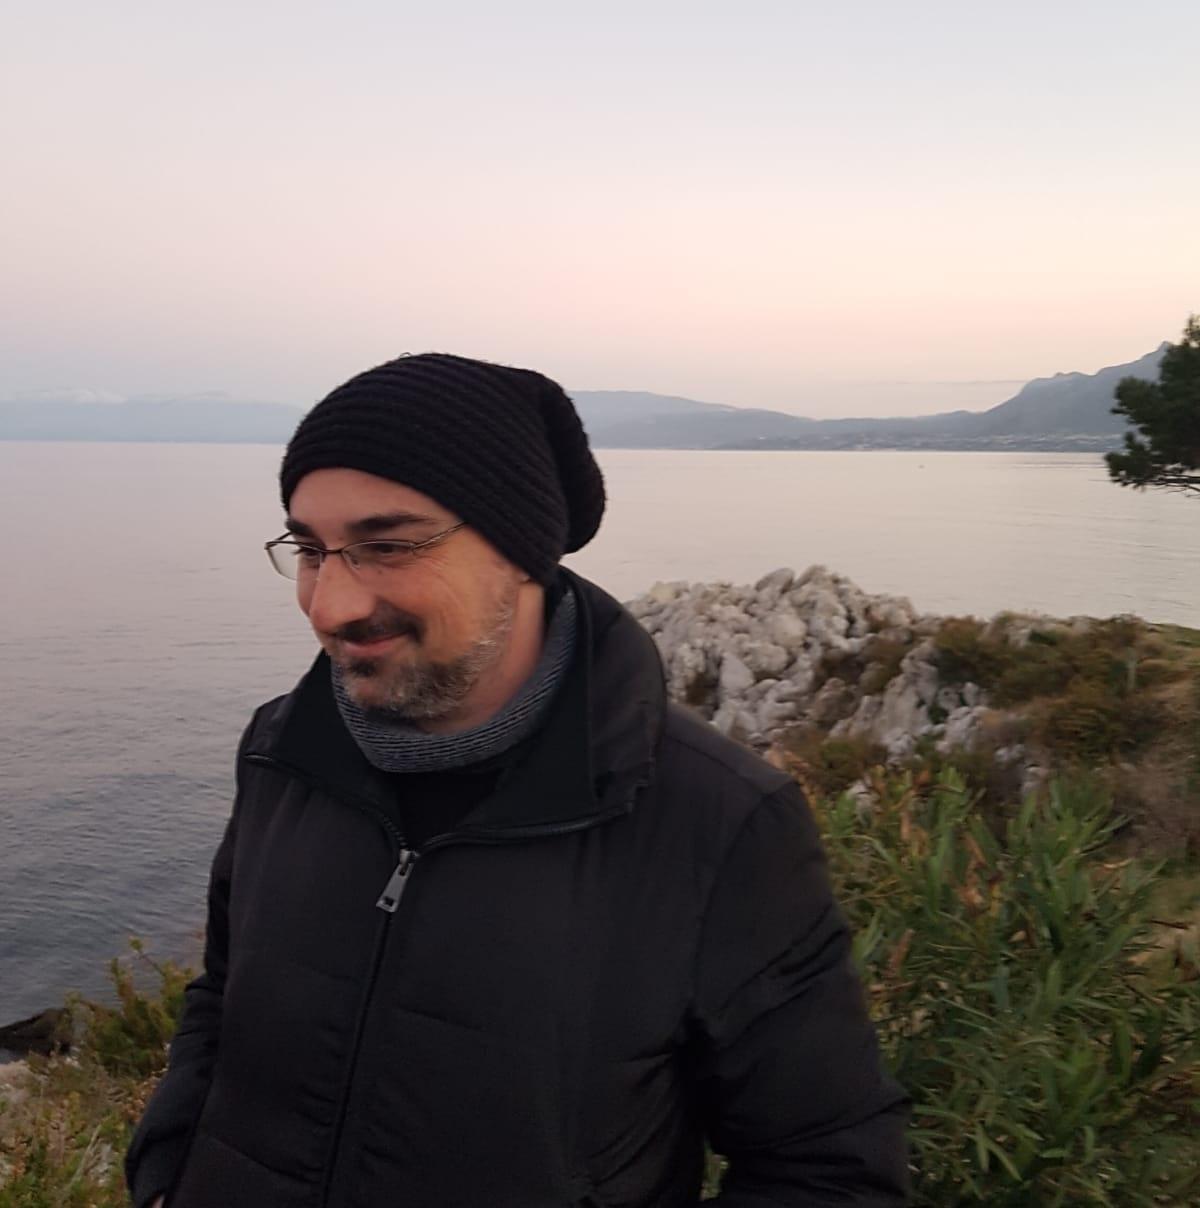 Marco Felice